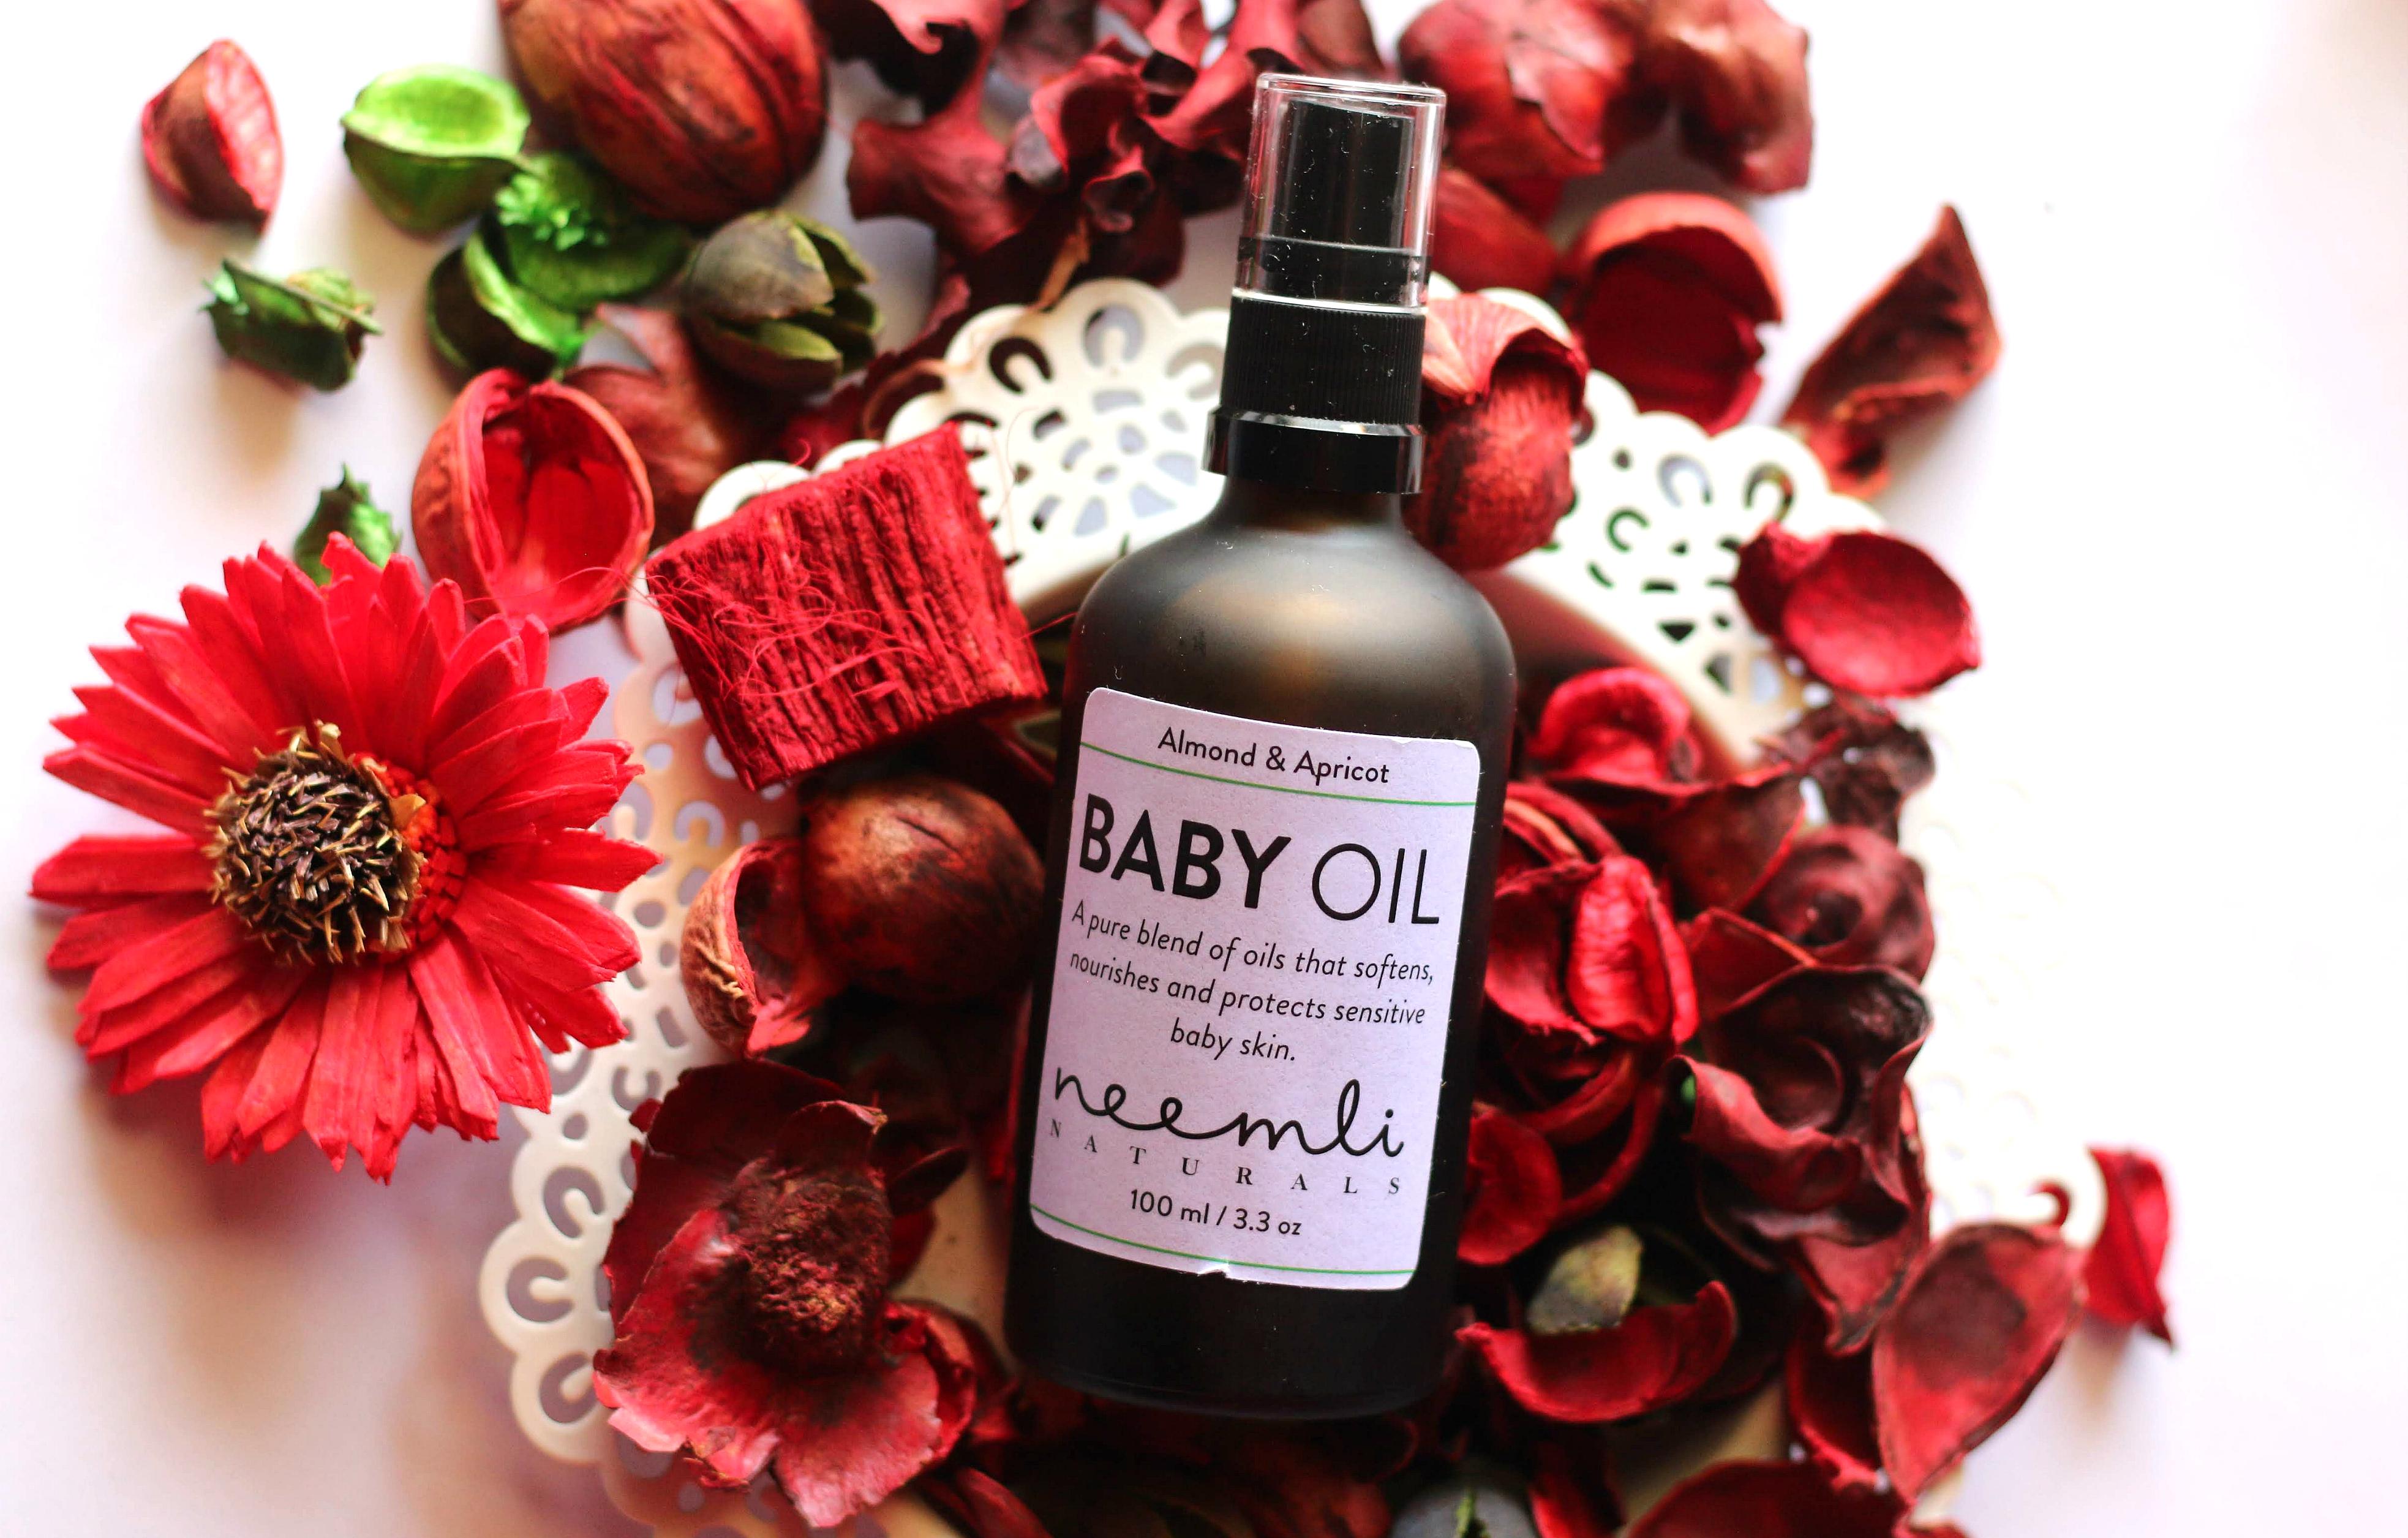 Neemli Naturals Sweet Almond & Apricot Baby Oil